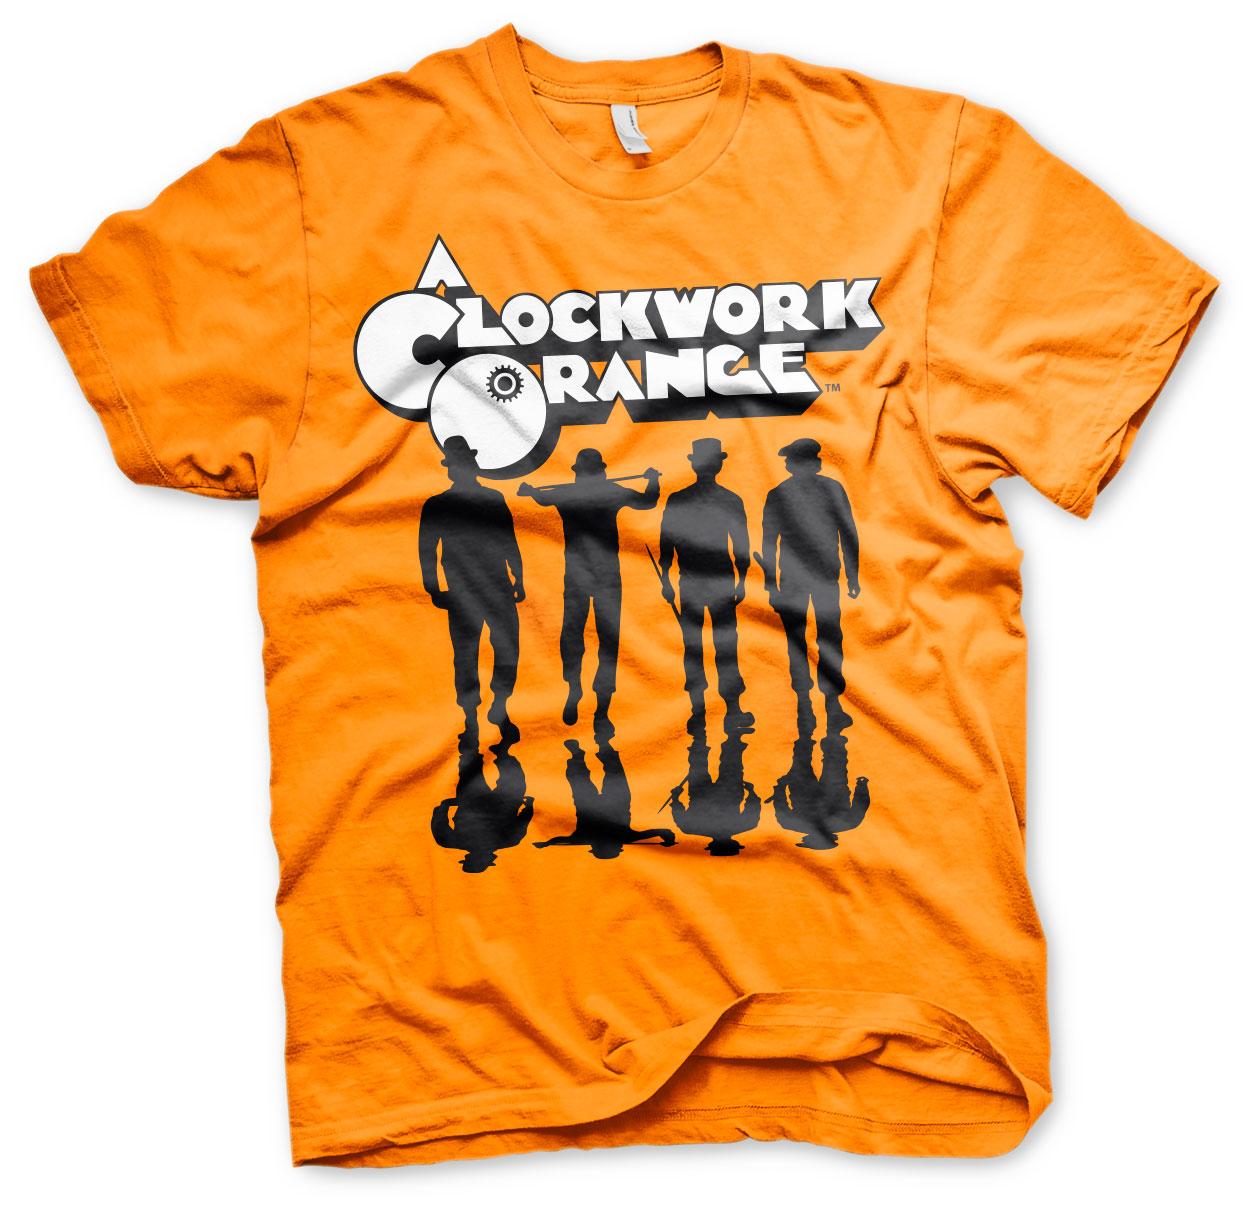 Tričká A Clockwork Orange